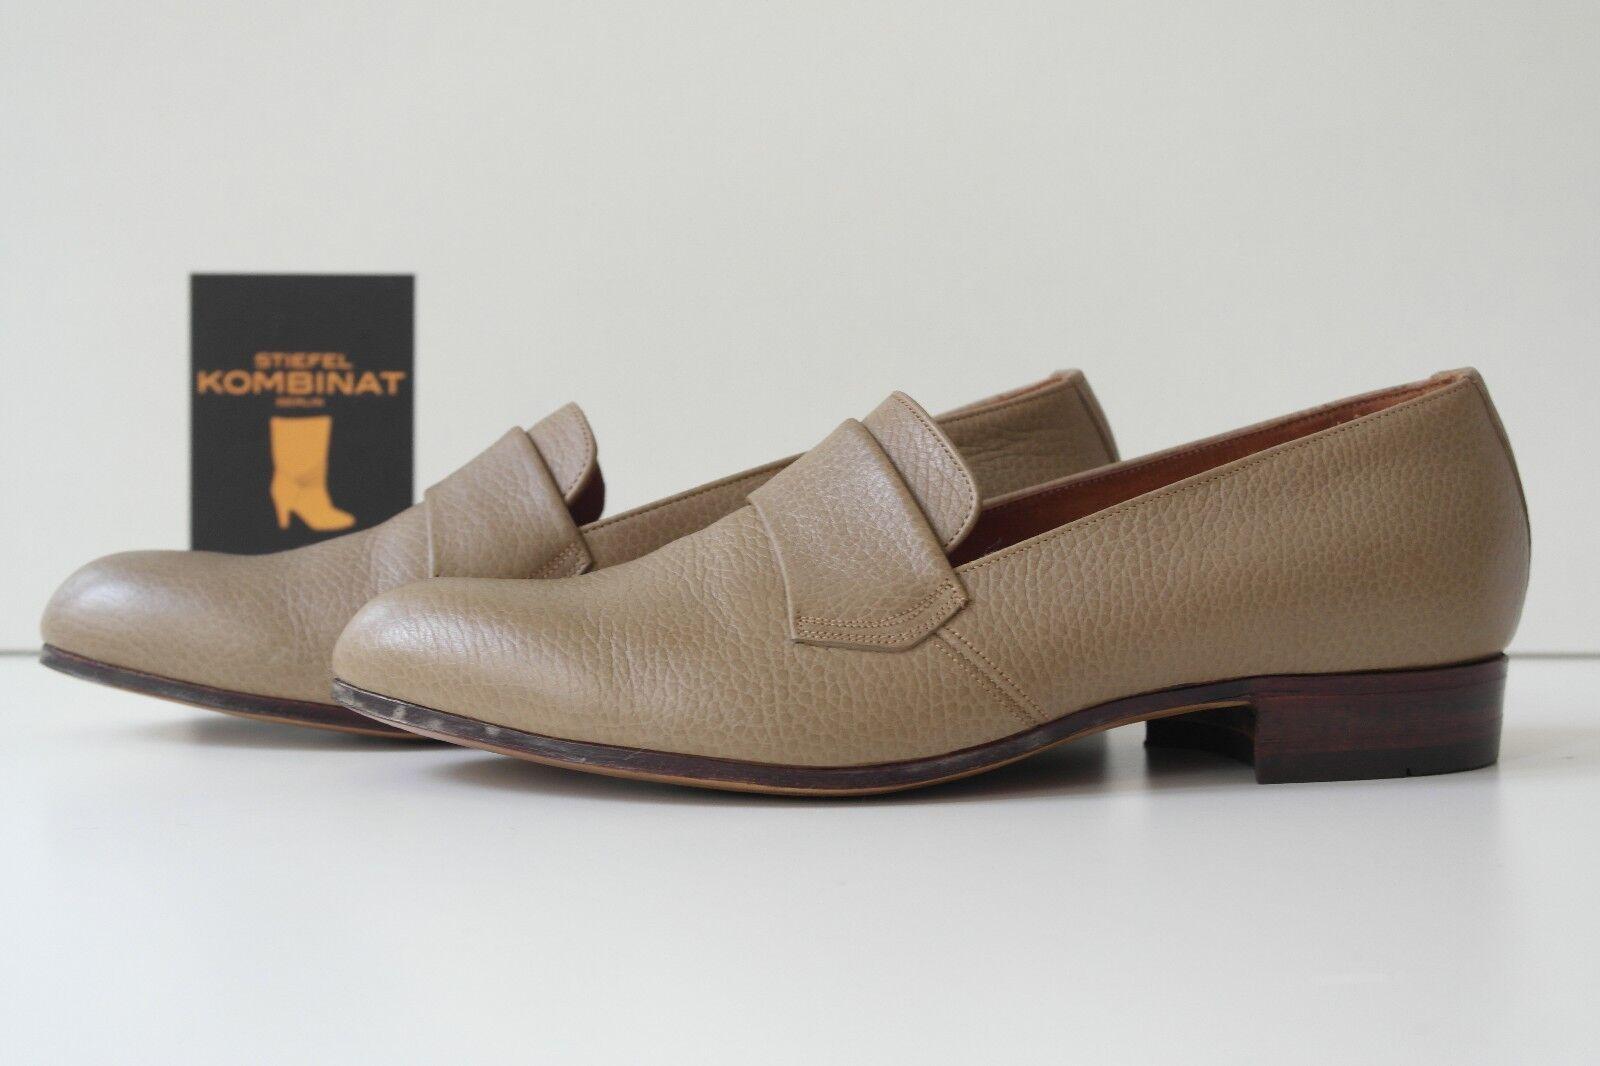 Rheinberger Mocassino Scarpe Scarpe Scarpe Da Uomo Scarpe Basse Slipper EUR 41 NOS True Vintage 8ee6d3